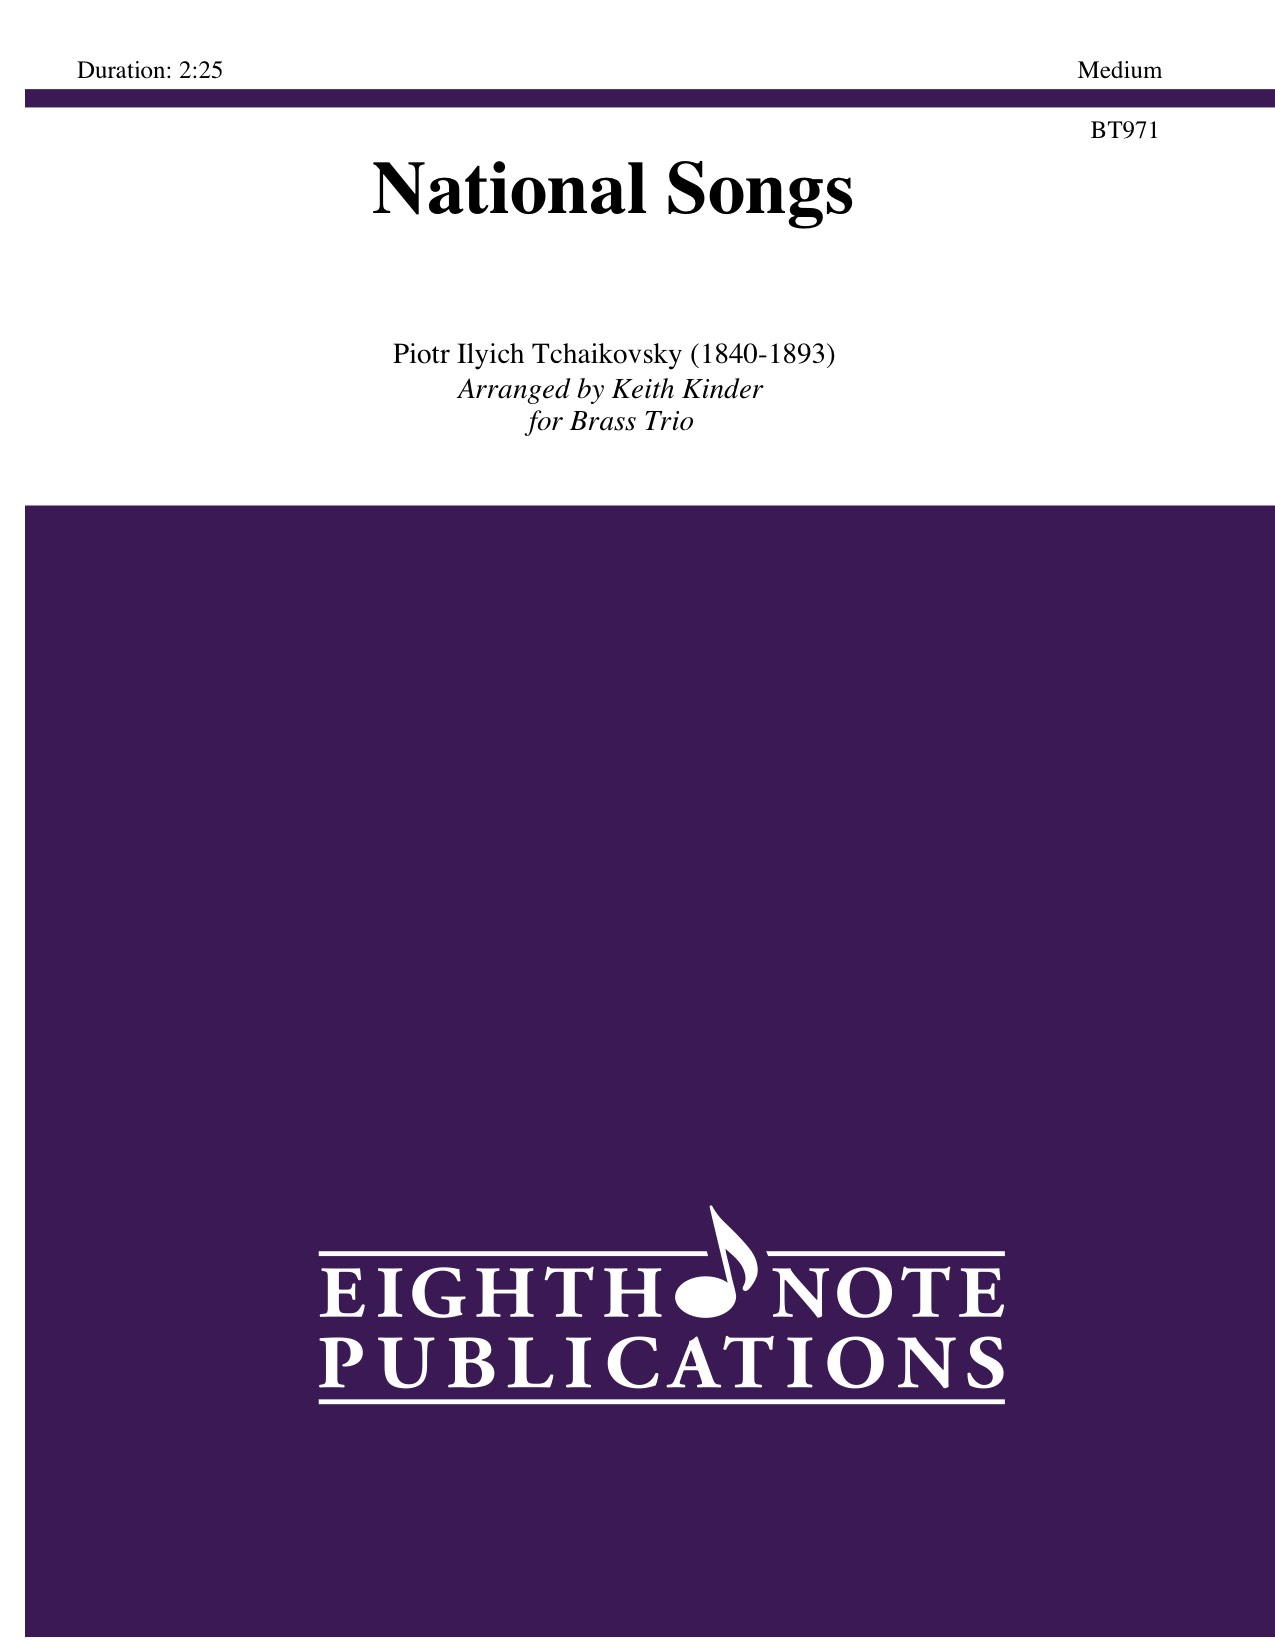 National Songs - Piotr Ilyich Tchaikovsky